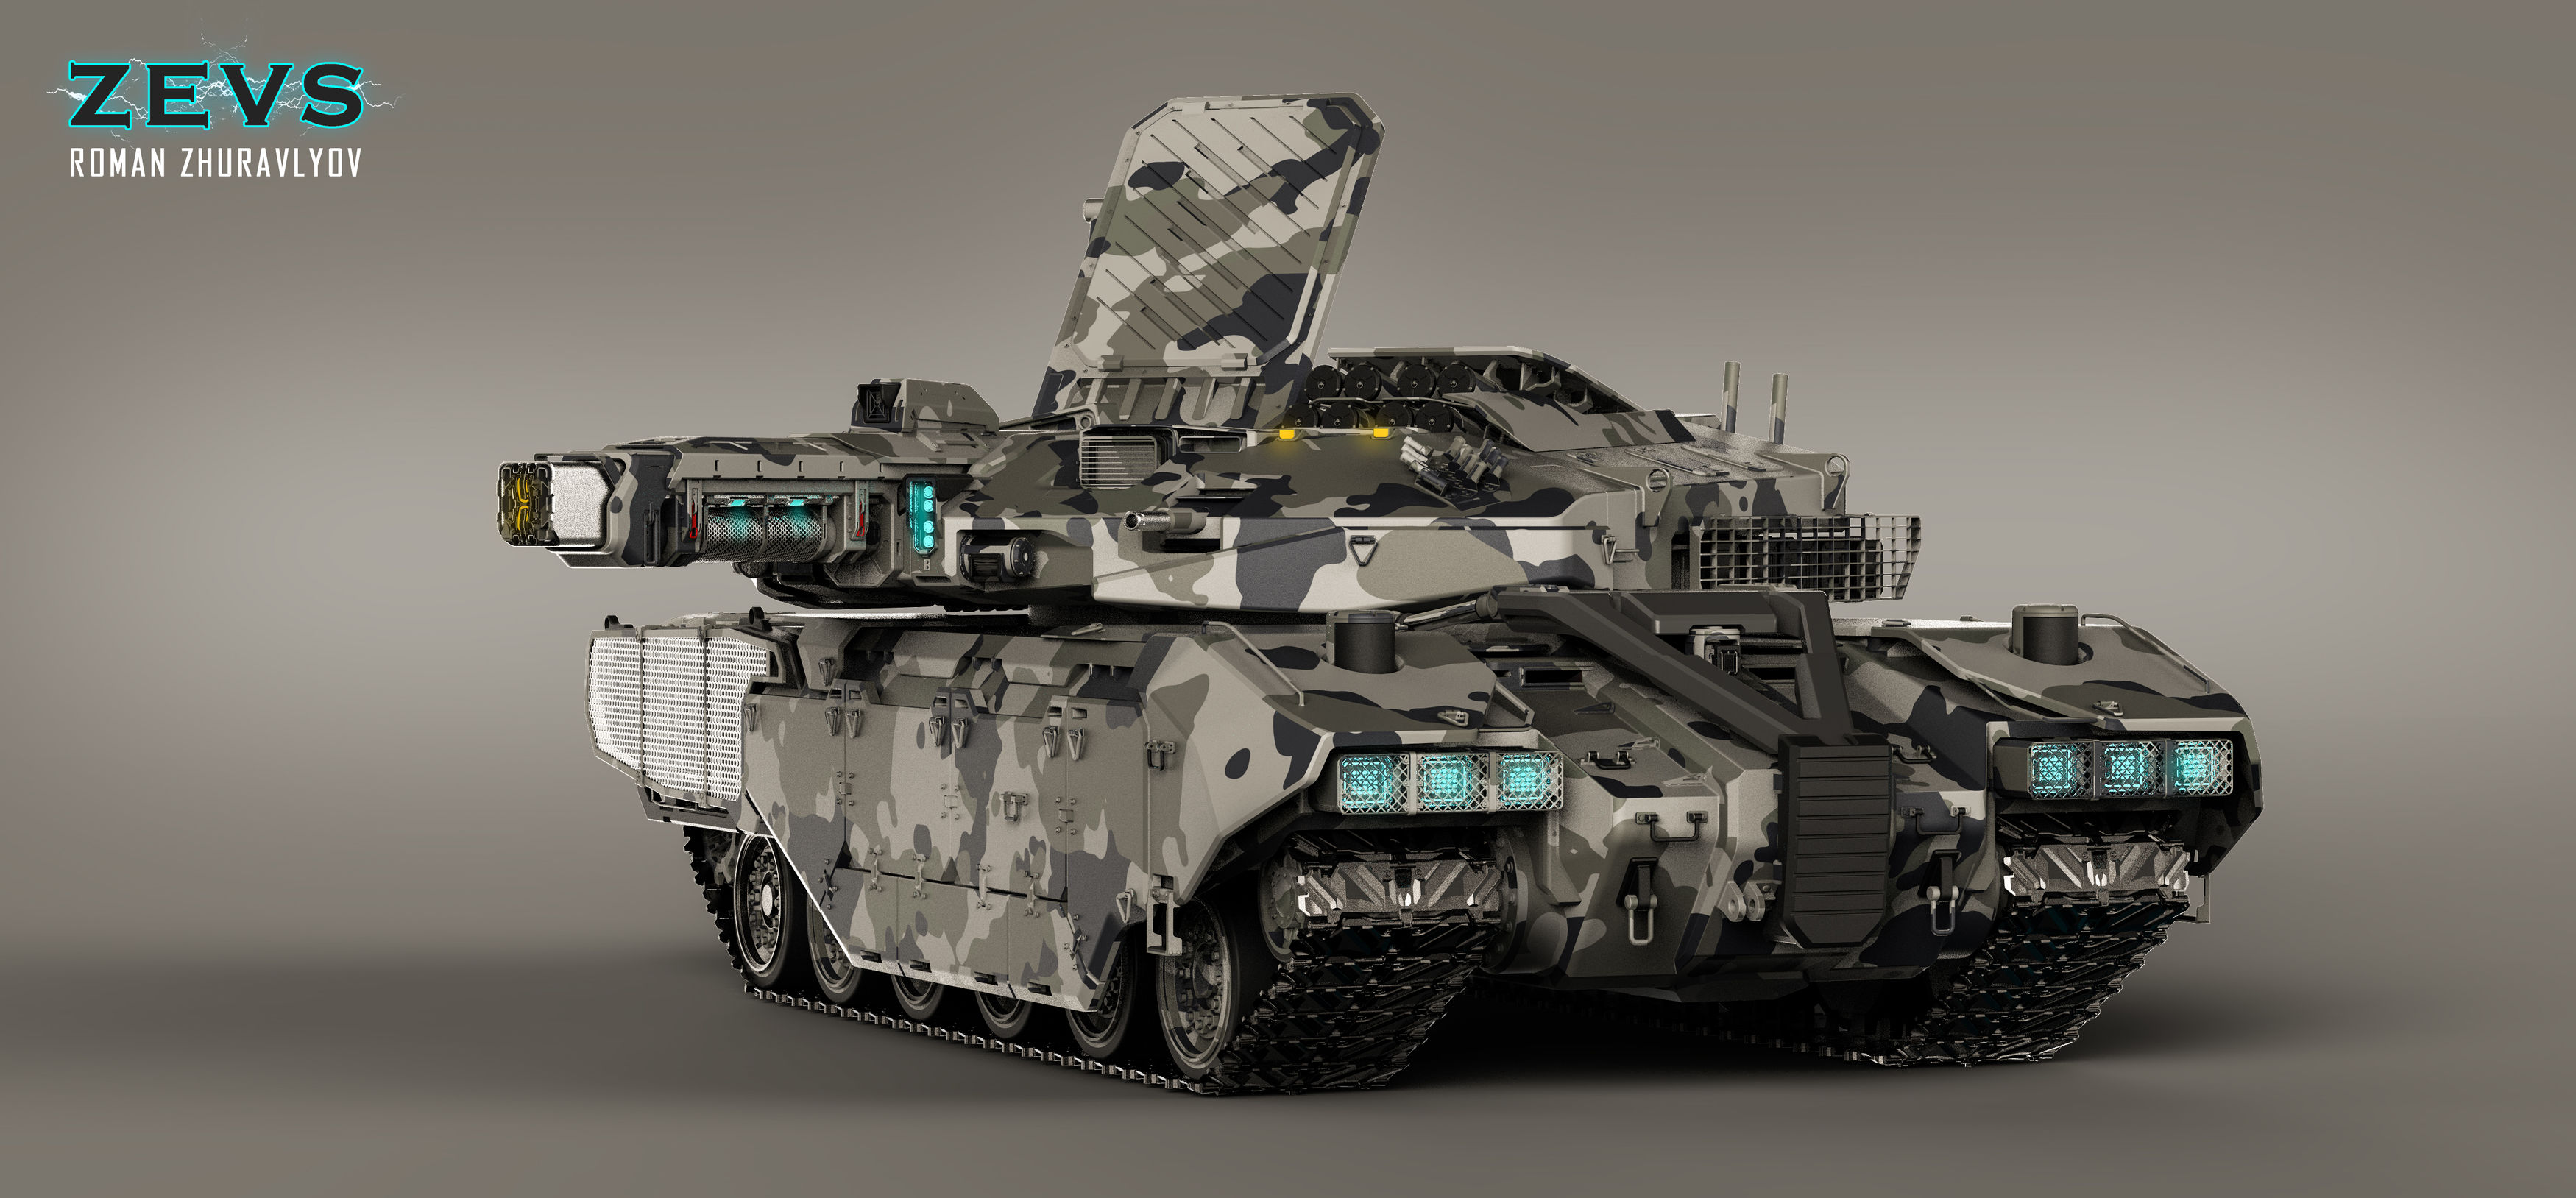 Tank-zevs-7-1-3500-3500